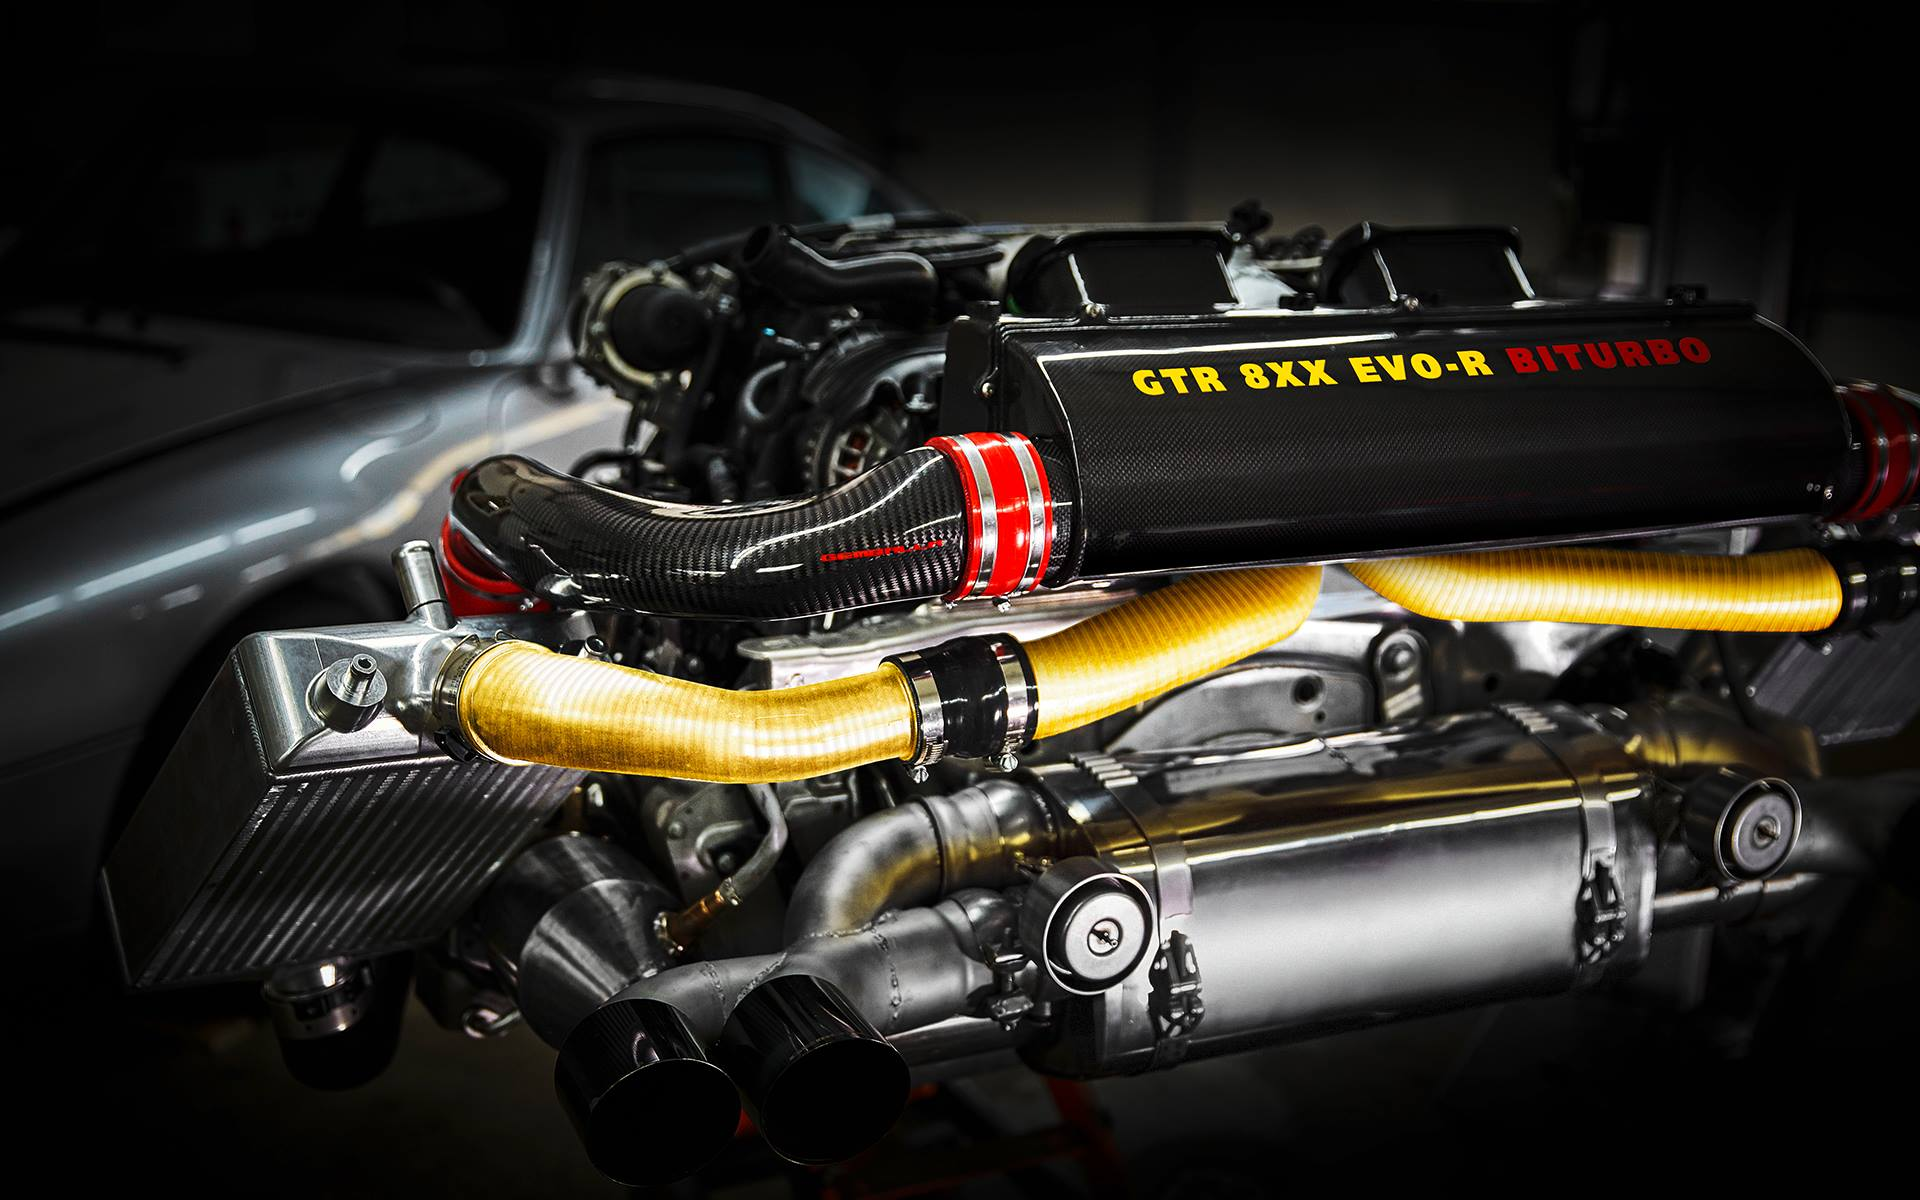 2015 Geneva Motor Show 3045 600x300 photo